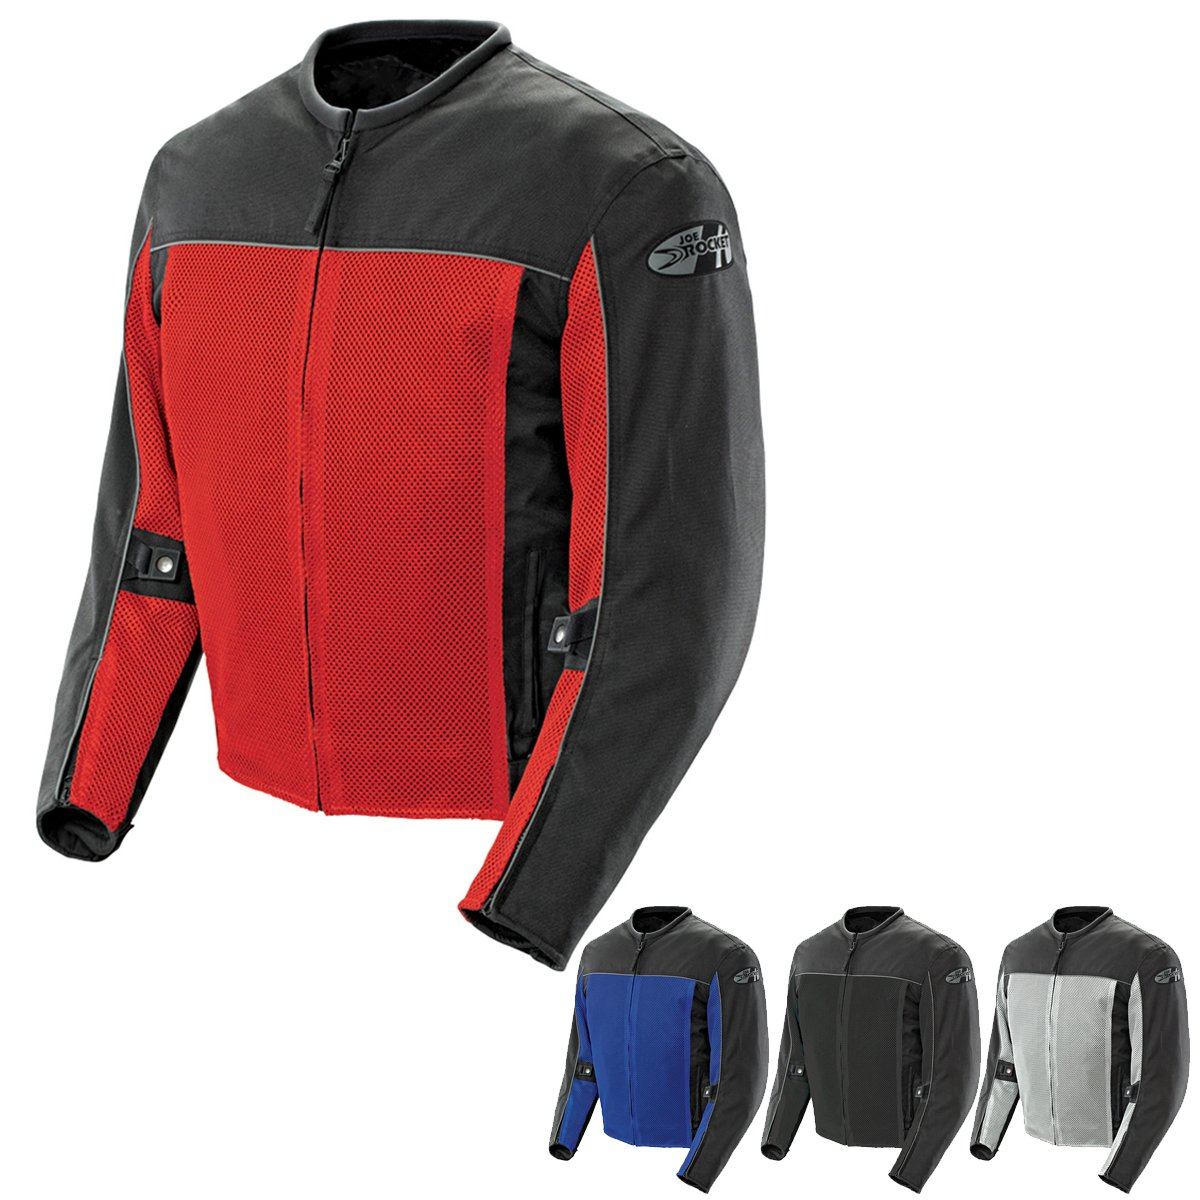 Joe Rocket 'Velocity' Mens Grey/Black Mesh Motorcycle Jacket - Gray / 2X-Large